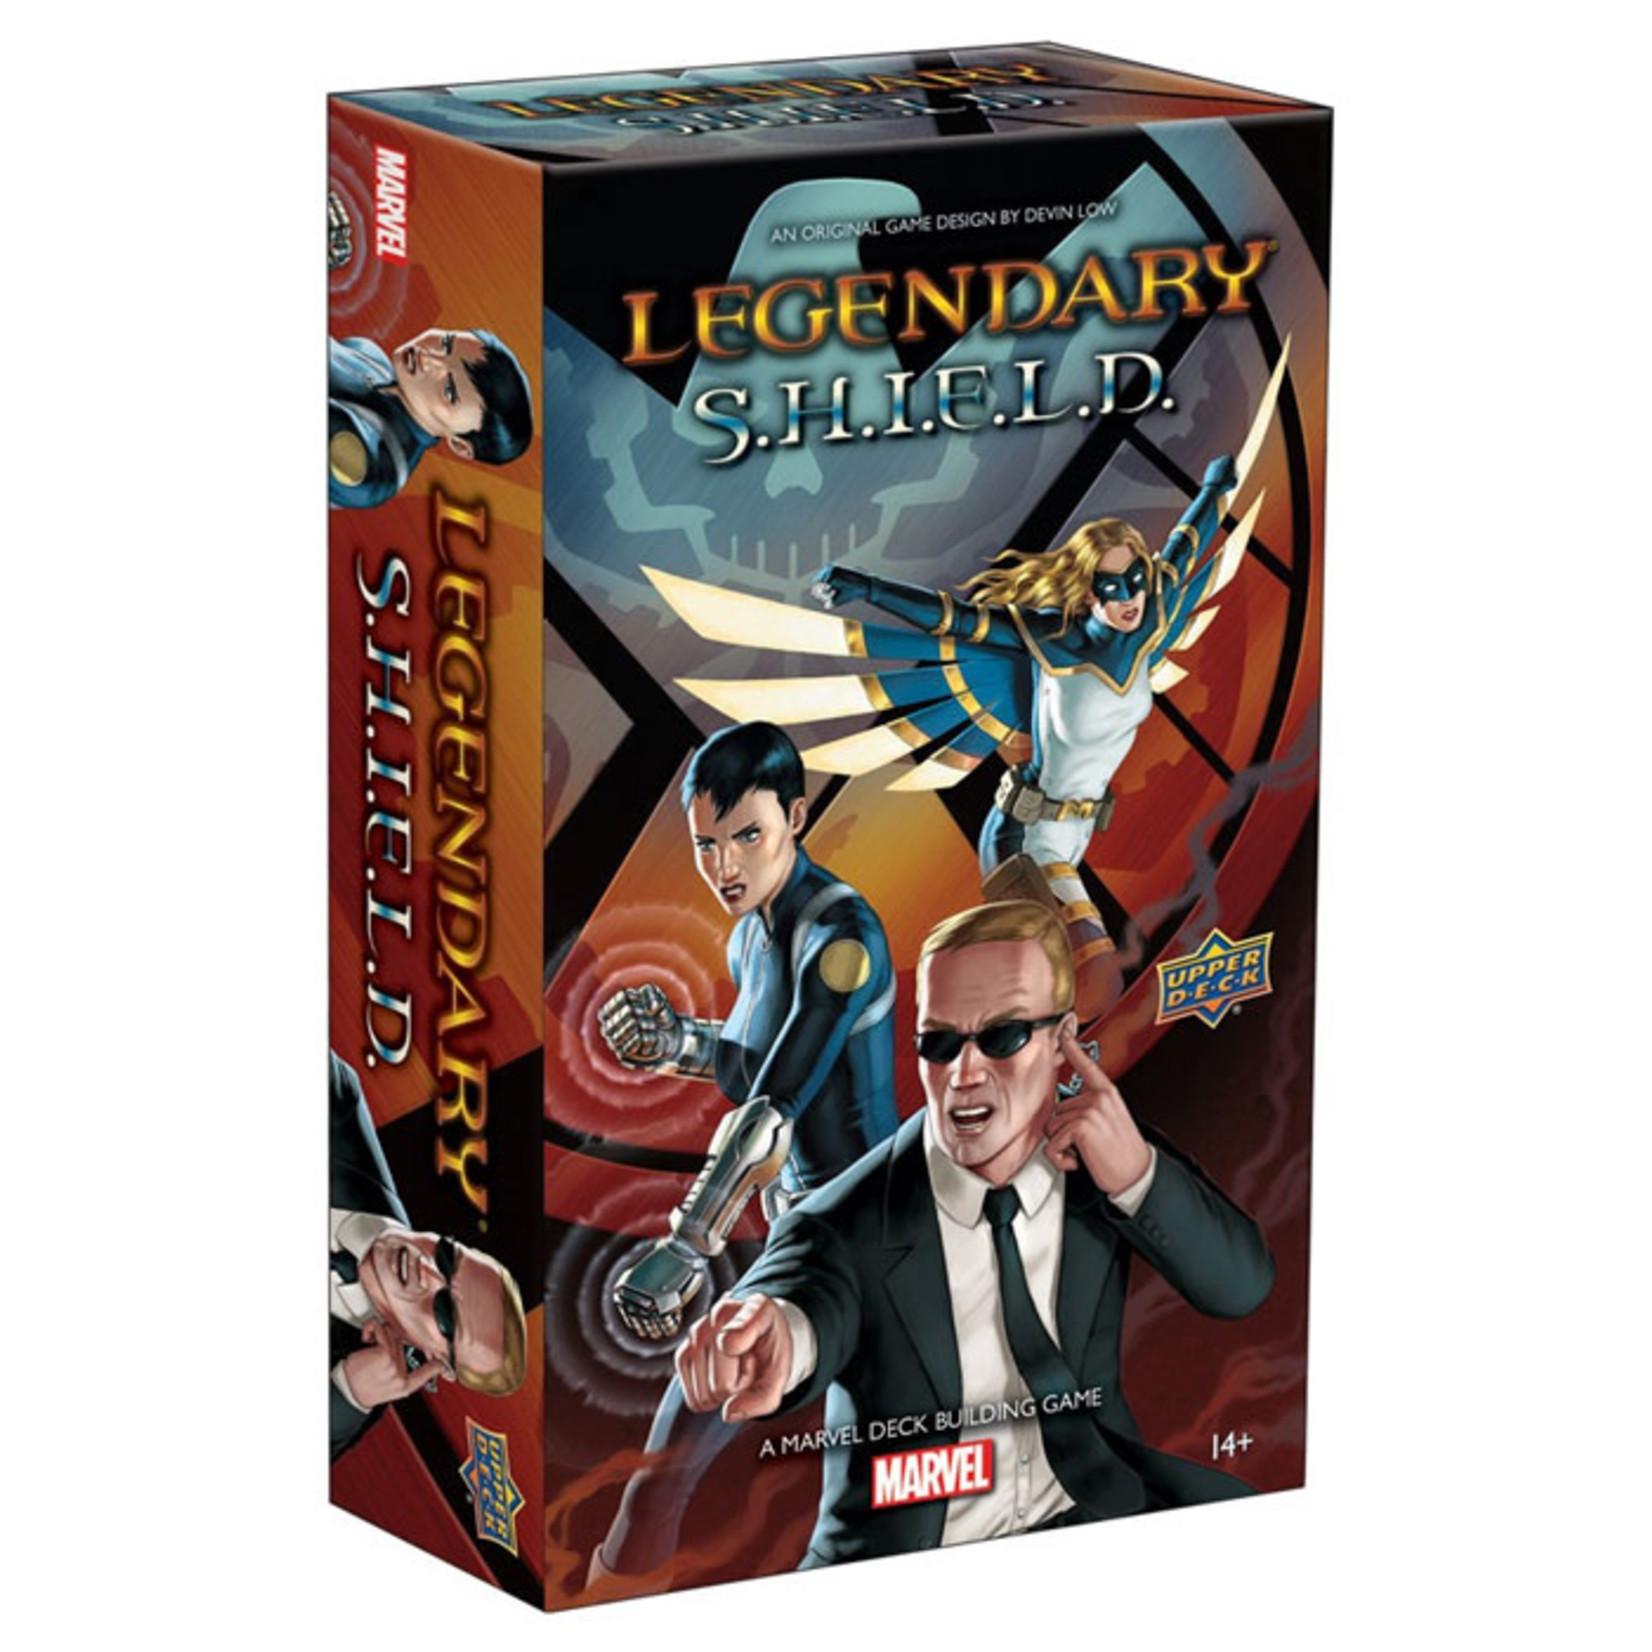 Upper Deck Legendary Marvel : S.H.I.E.L.D. expansion